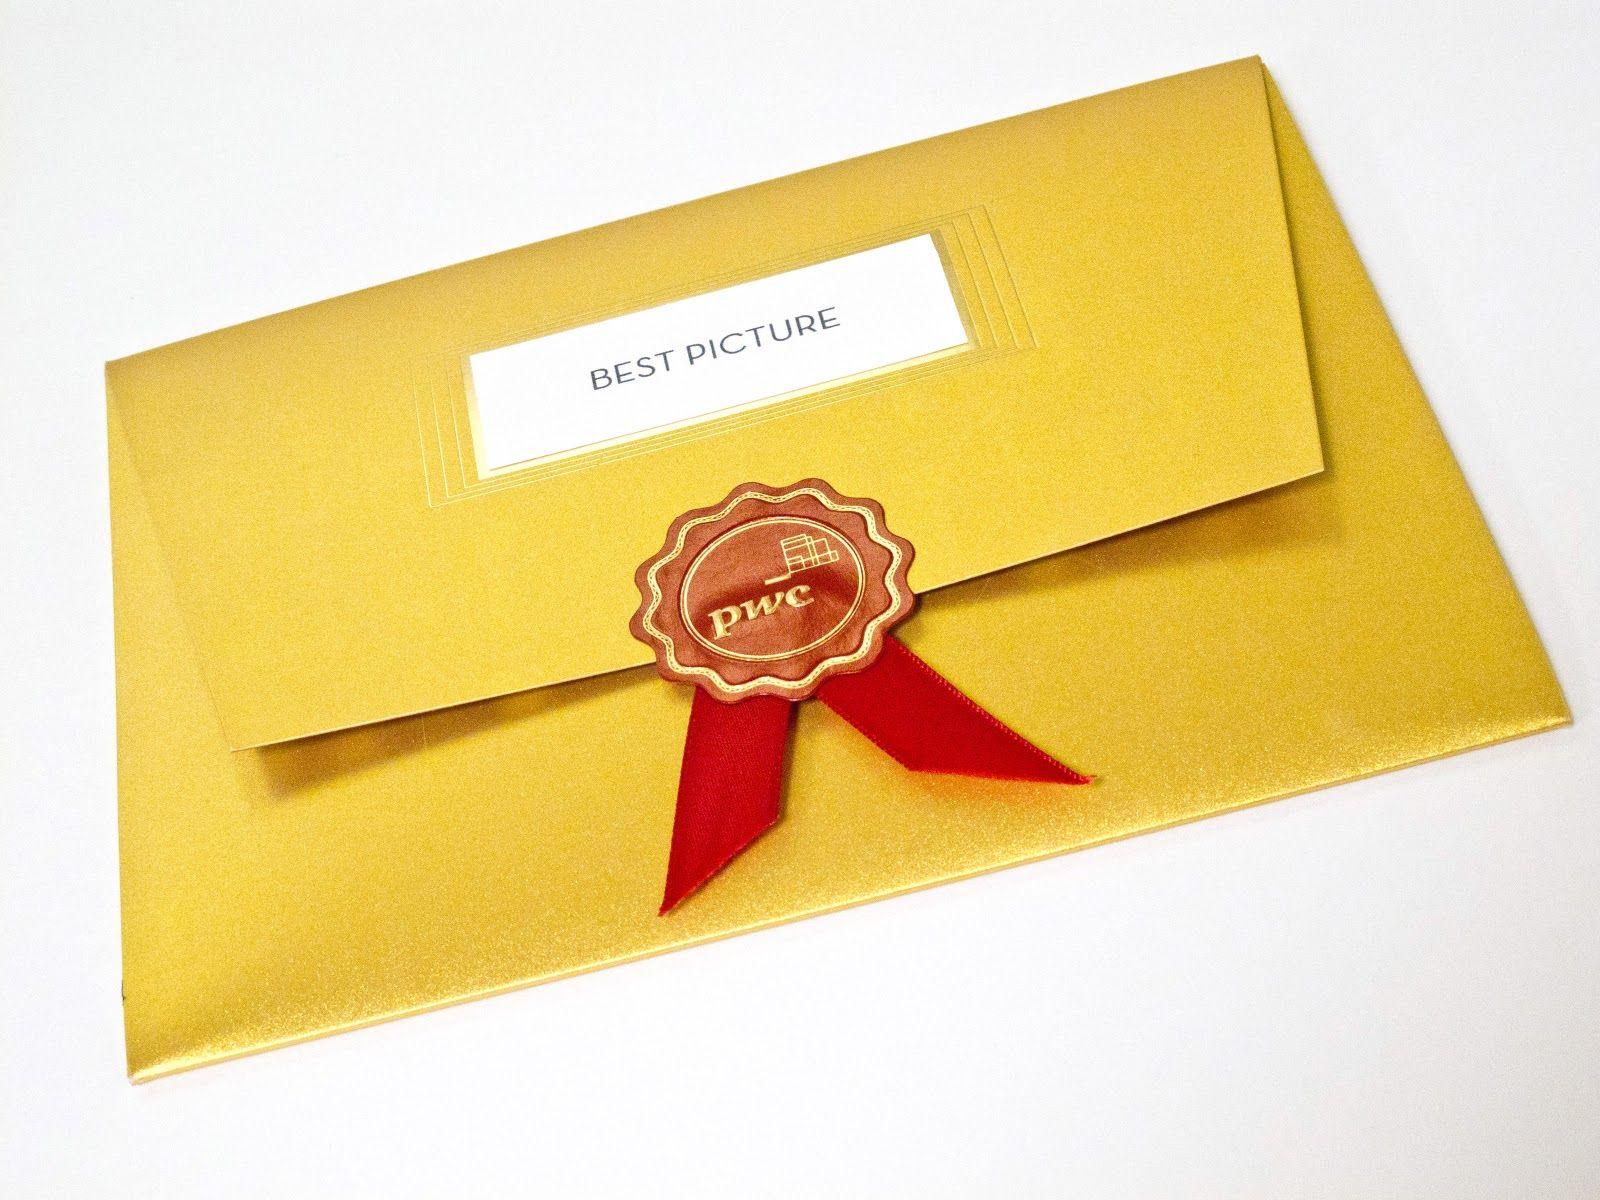 Academy Awards Envelope Clipart.